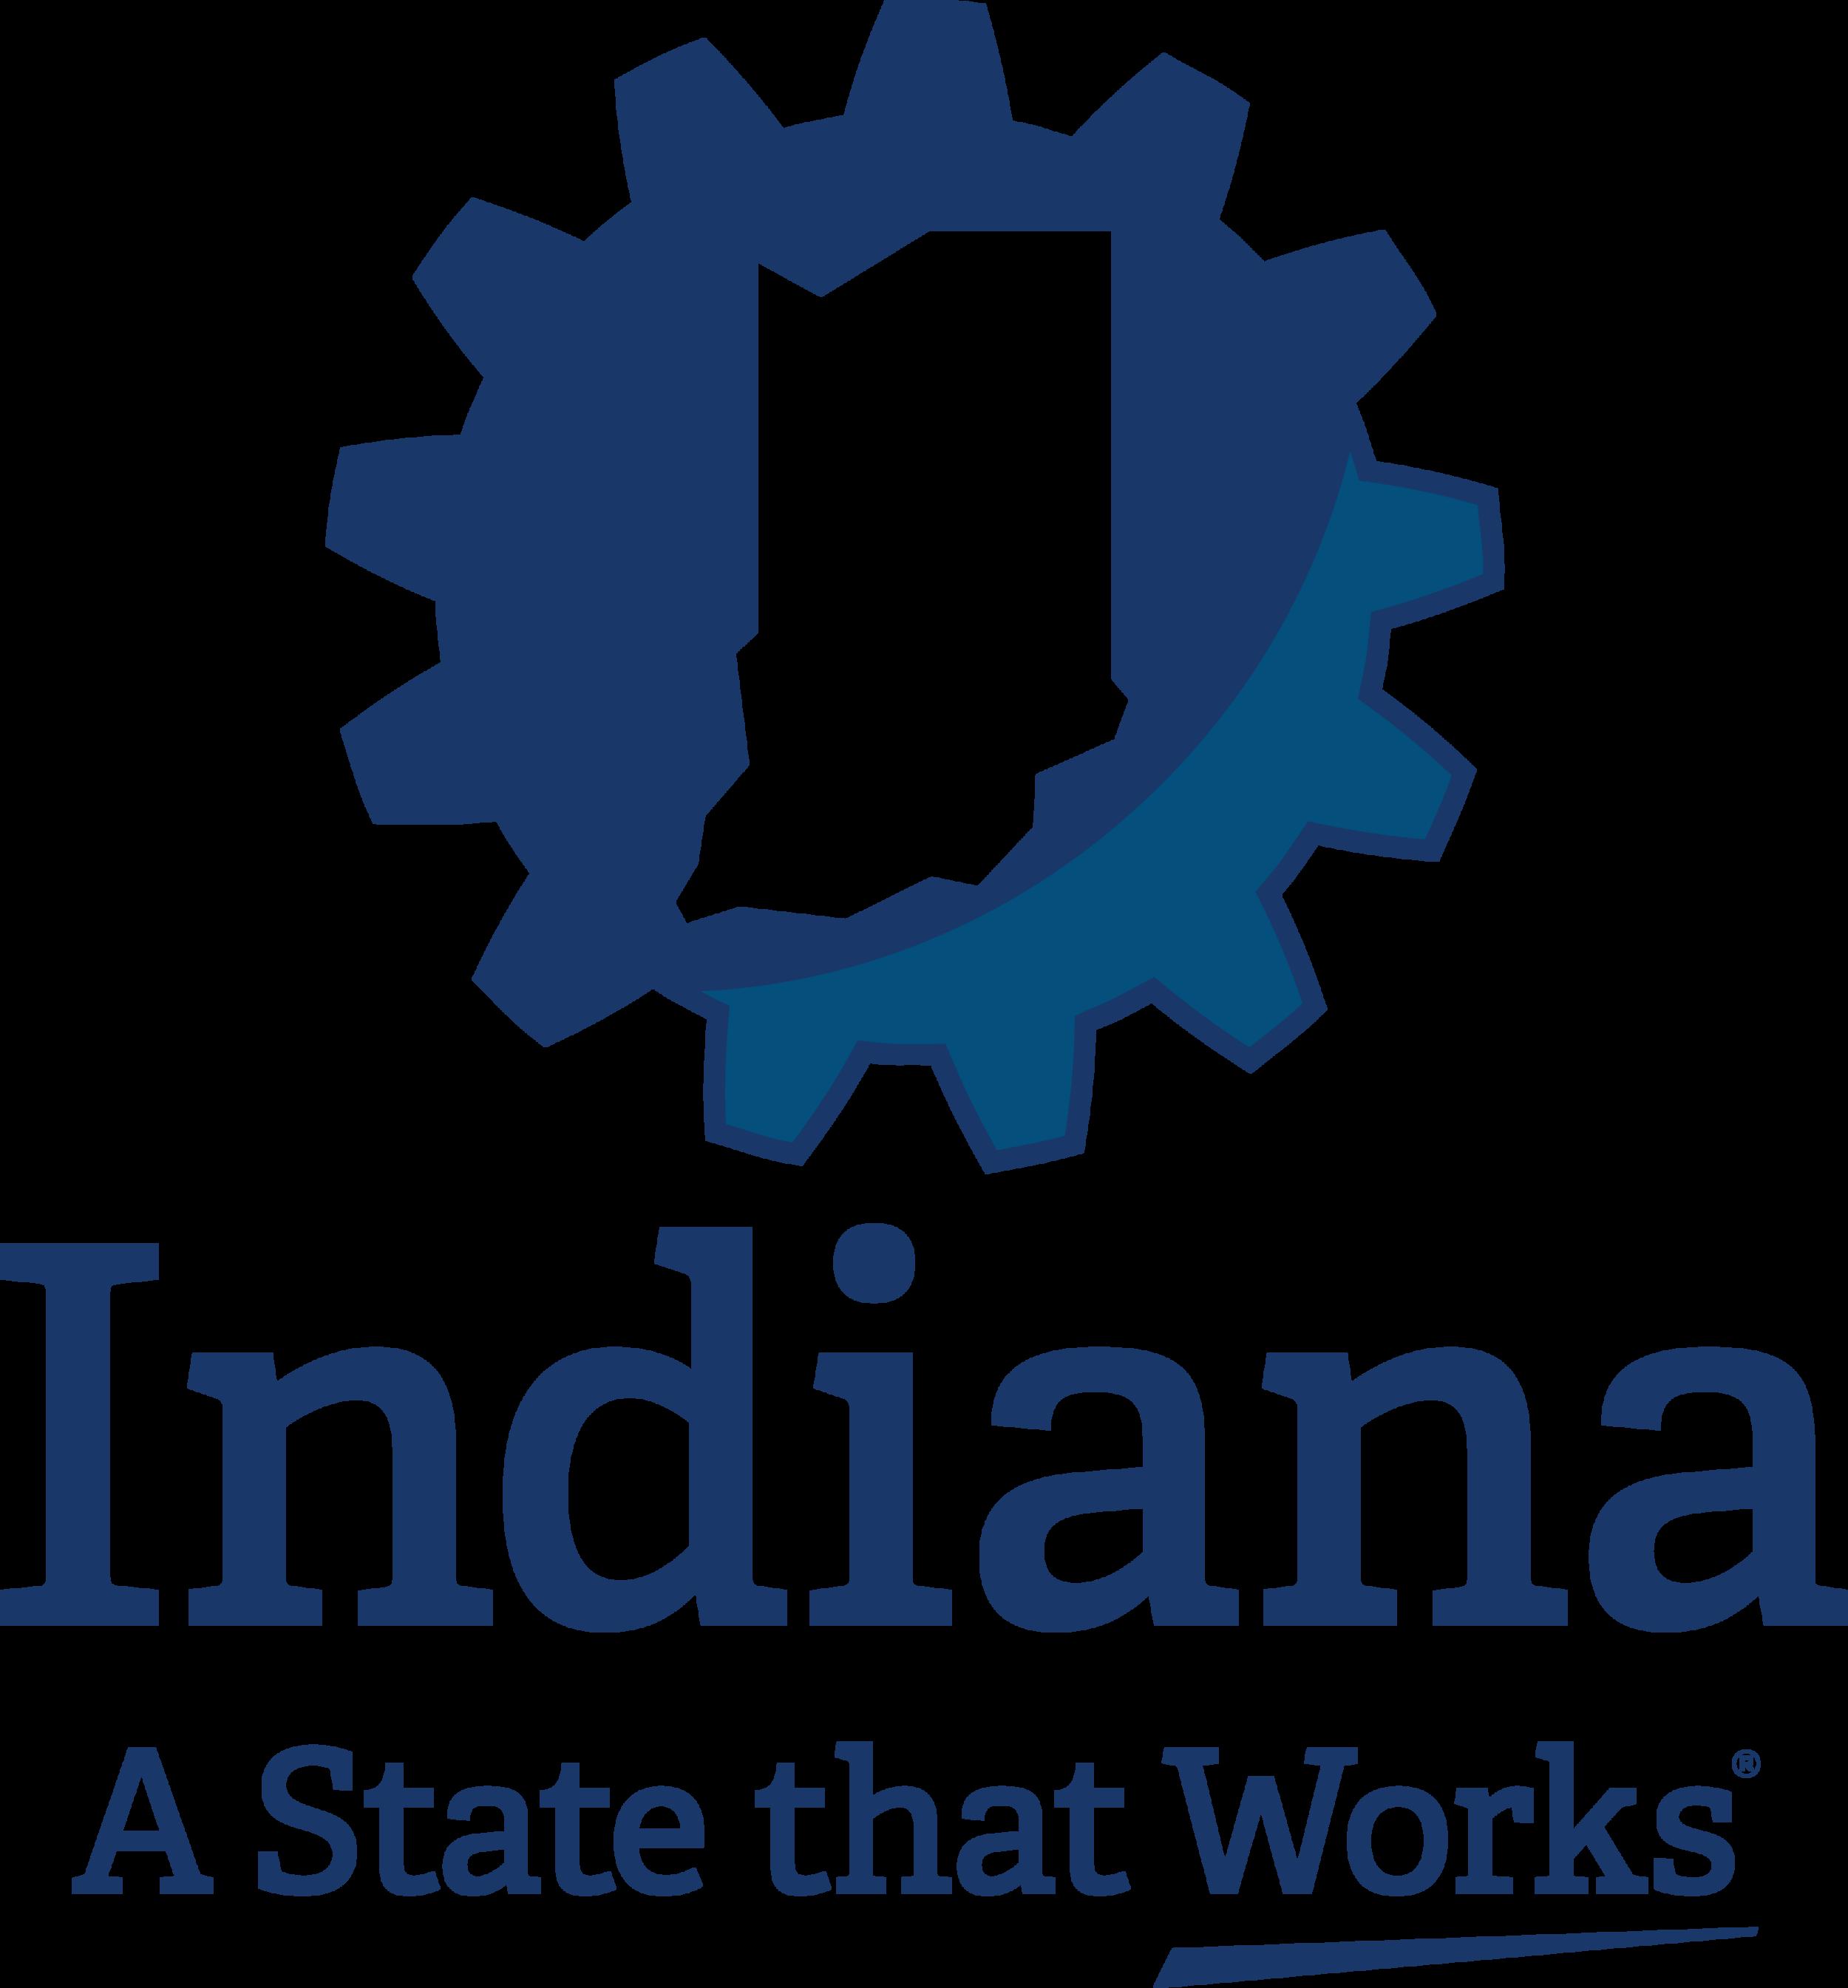 Indiana Economic Development Corporation-Vertical-Blue.png